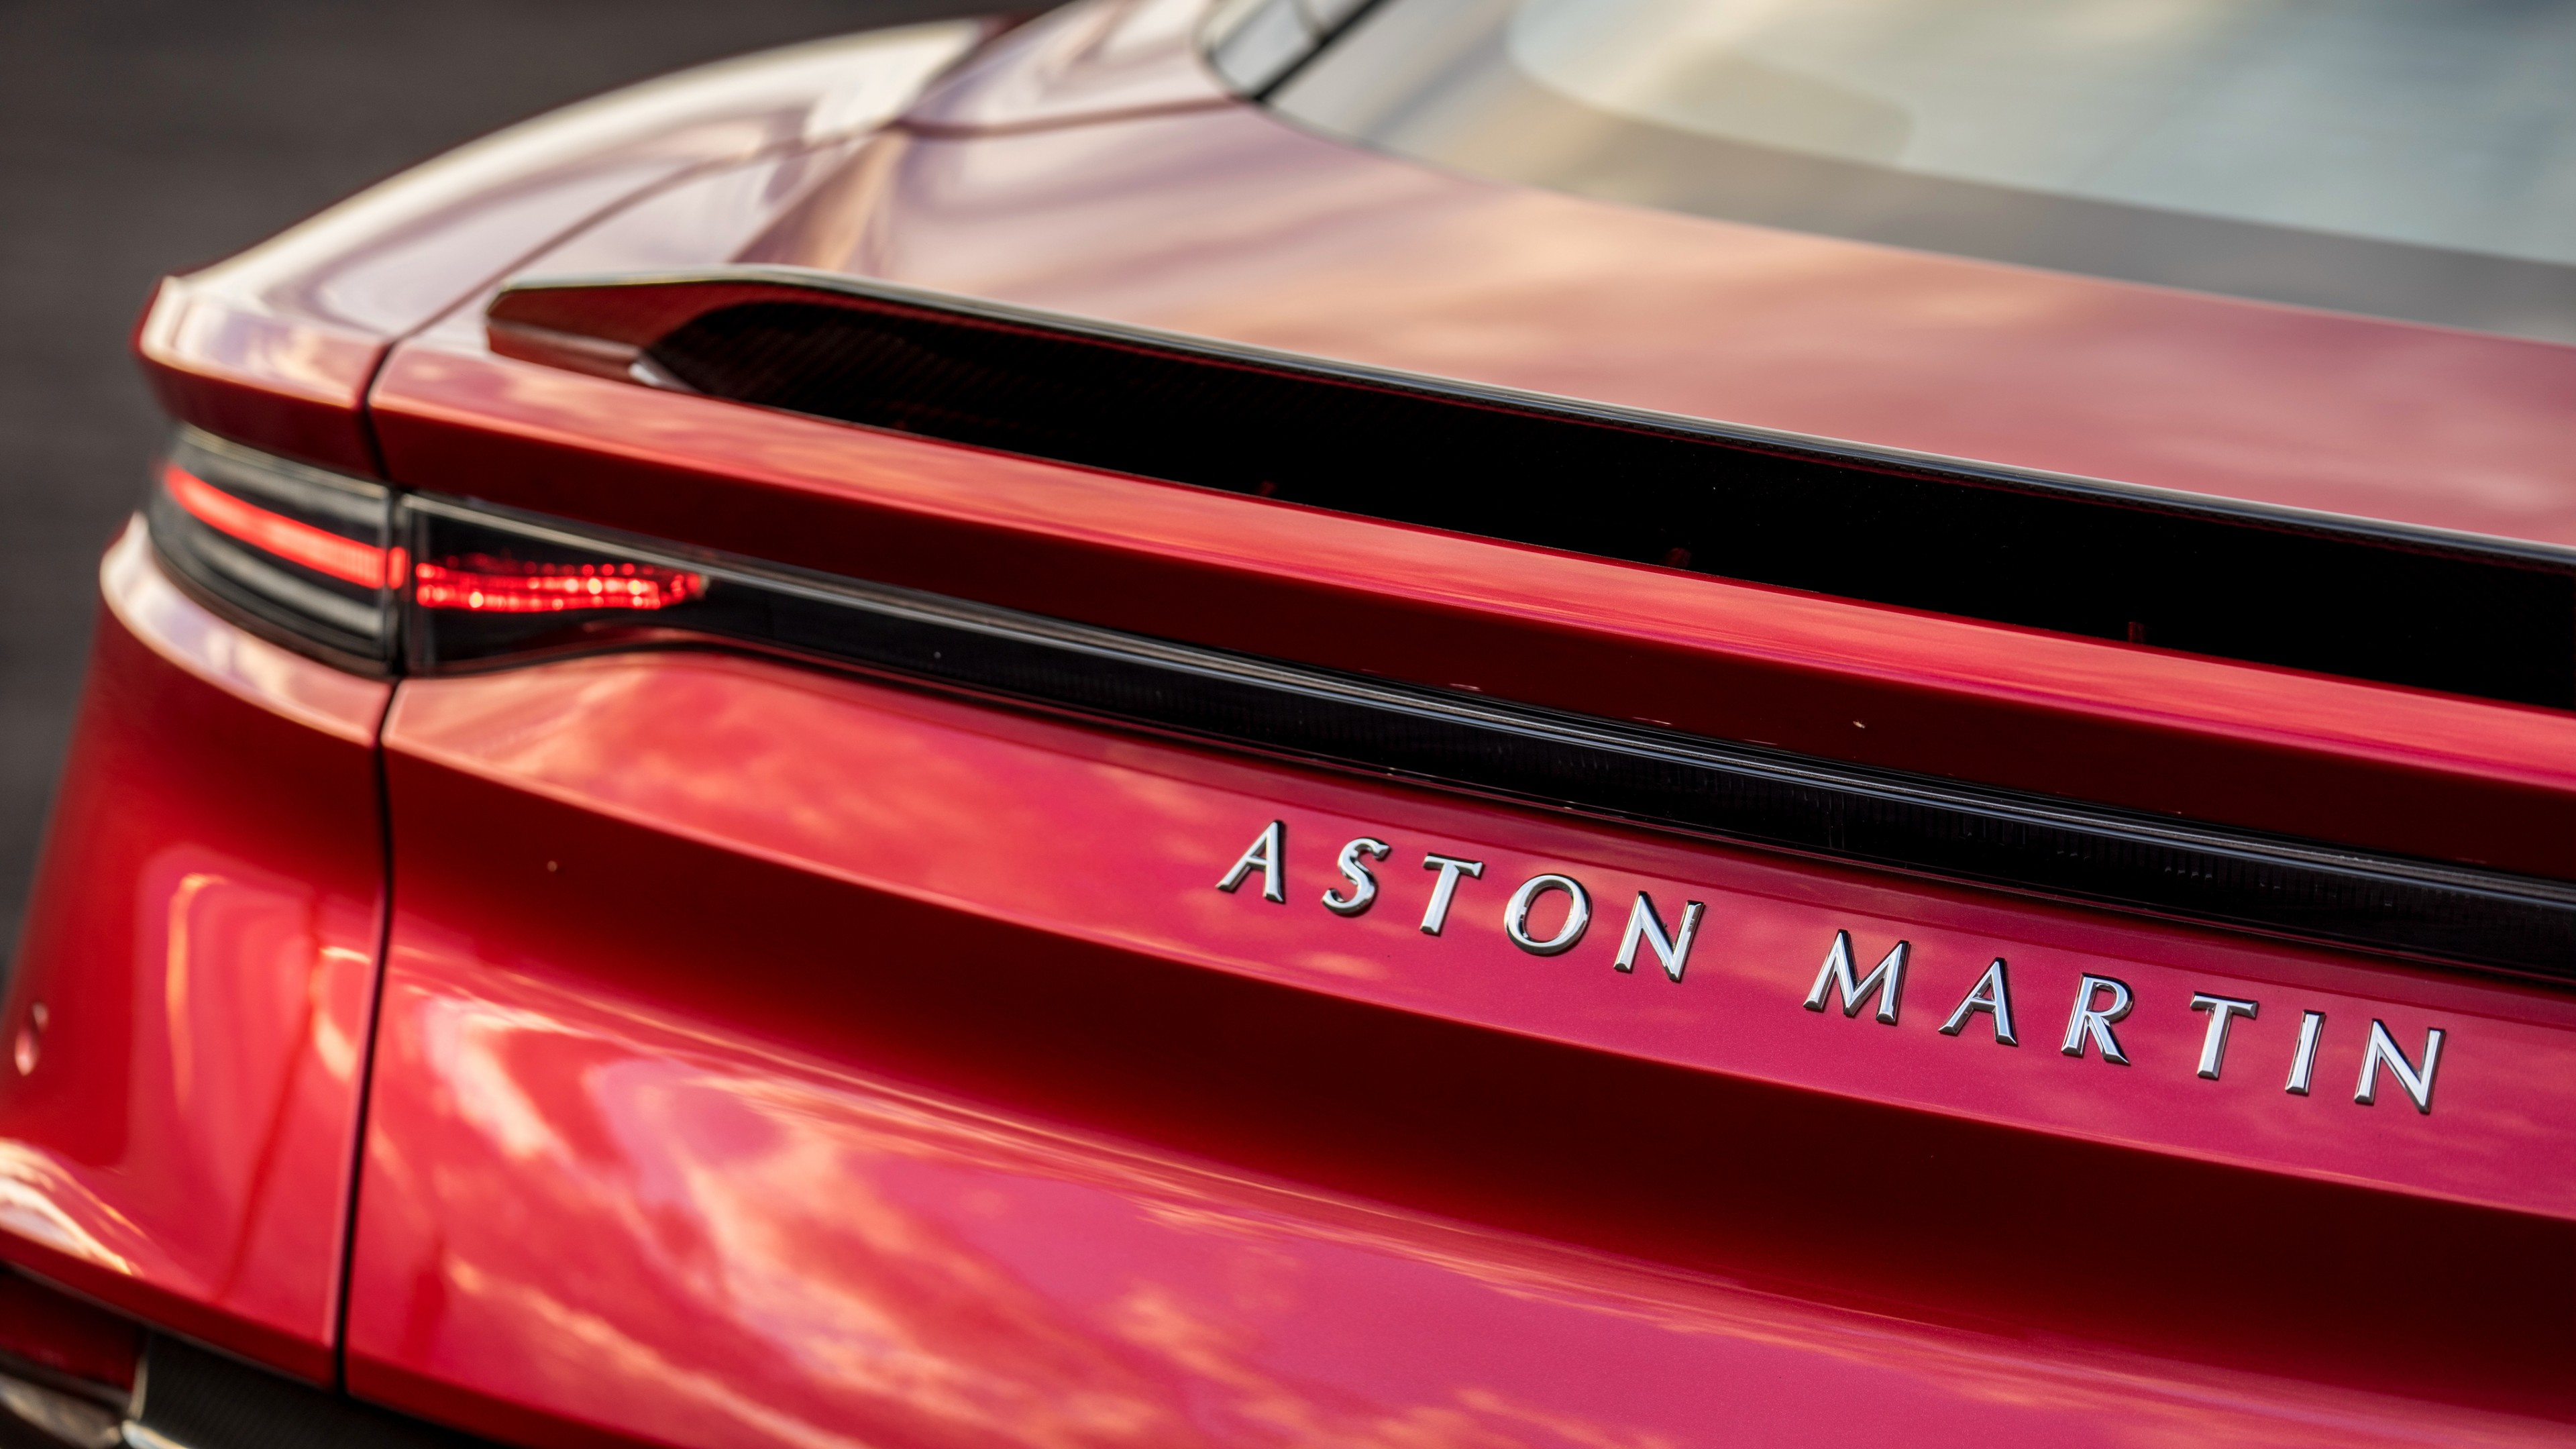 Aston Martin Dbs Superleggera 2018 4k 2 Wallpaper Hd Car Wallpapers Id 10742